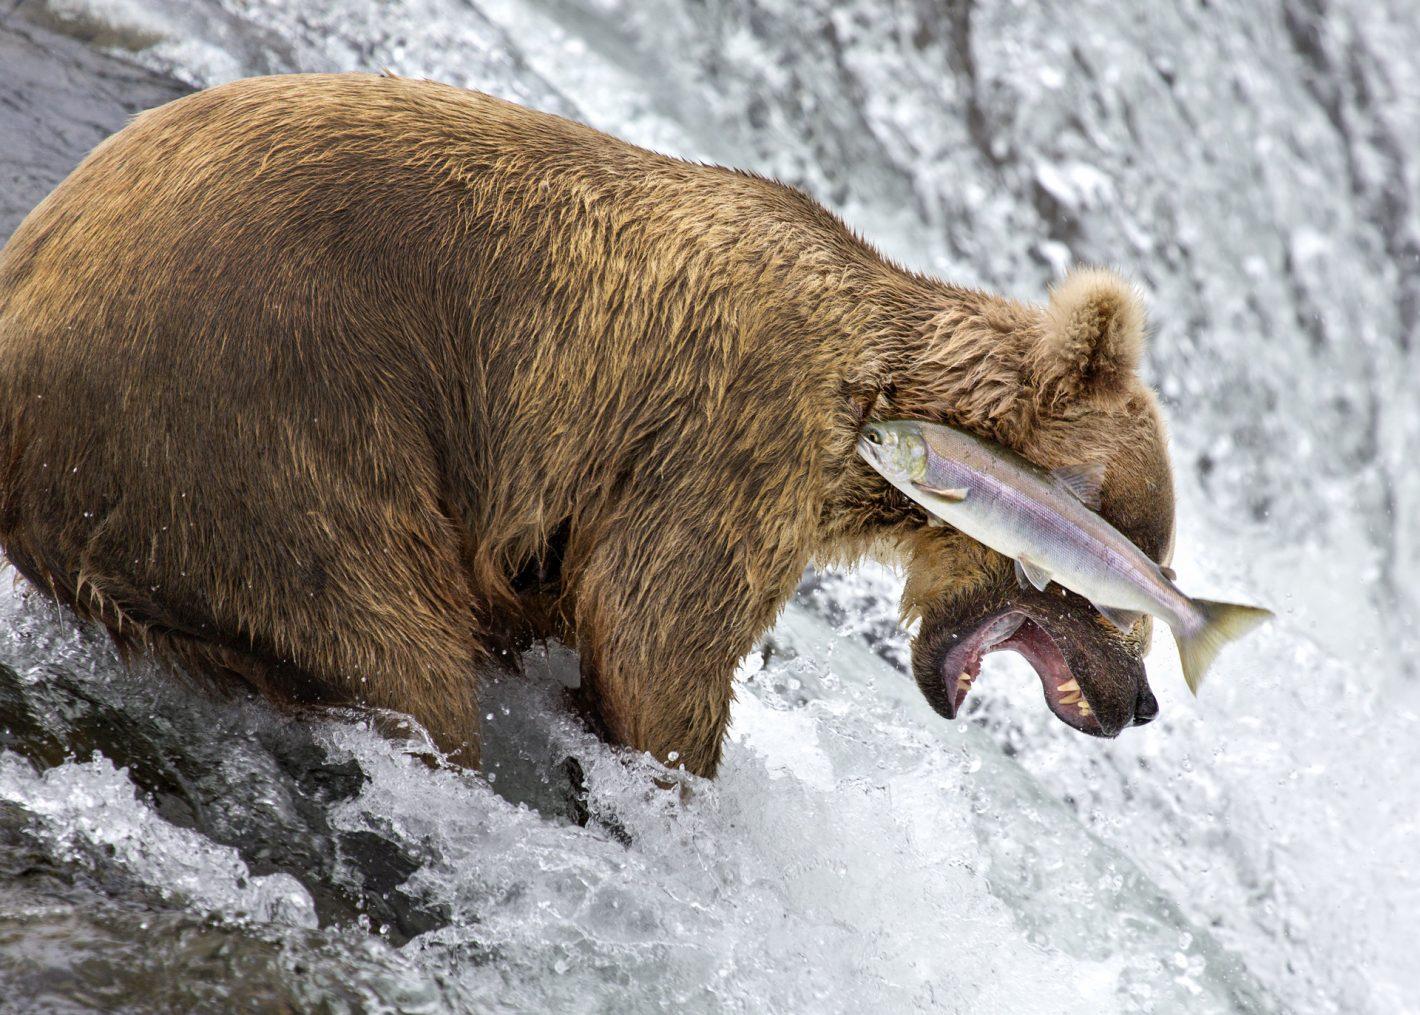 Wildlife Rob Kroenert Nikon